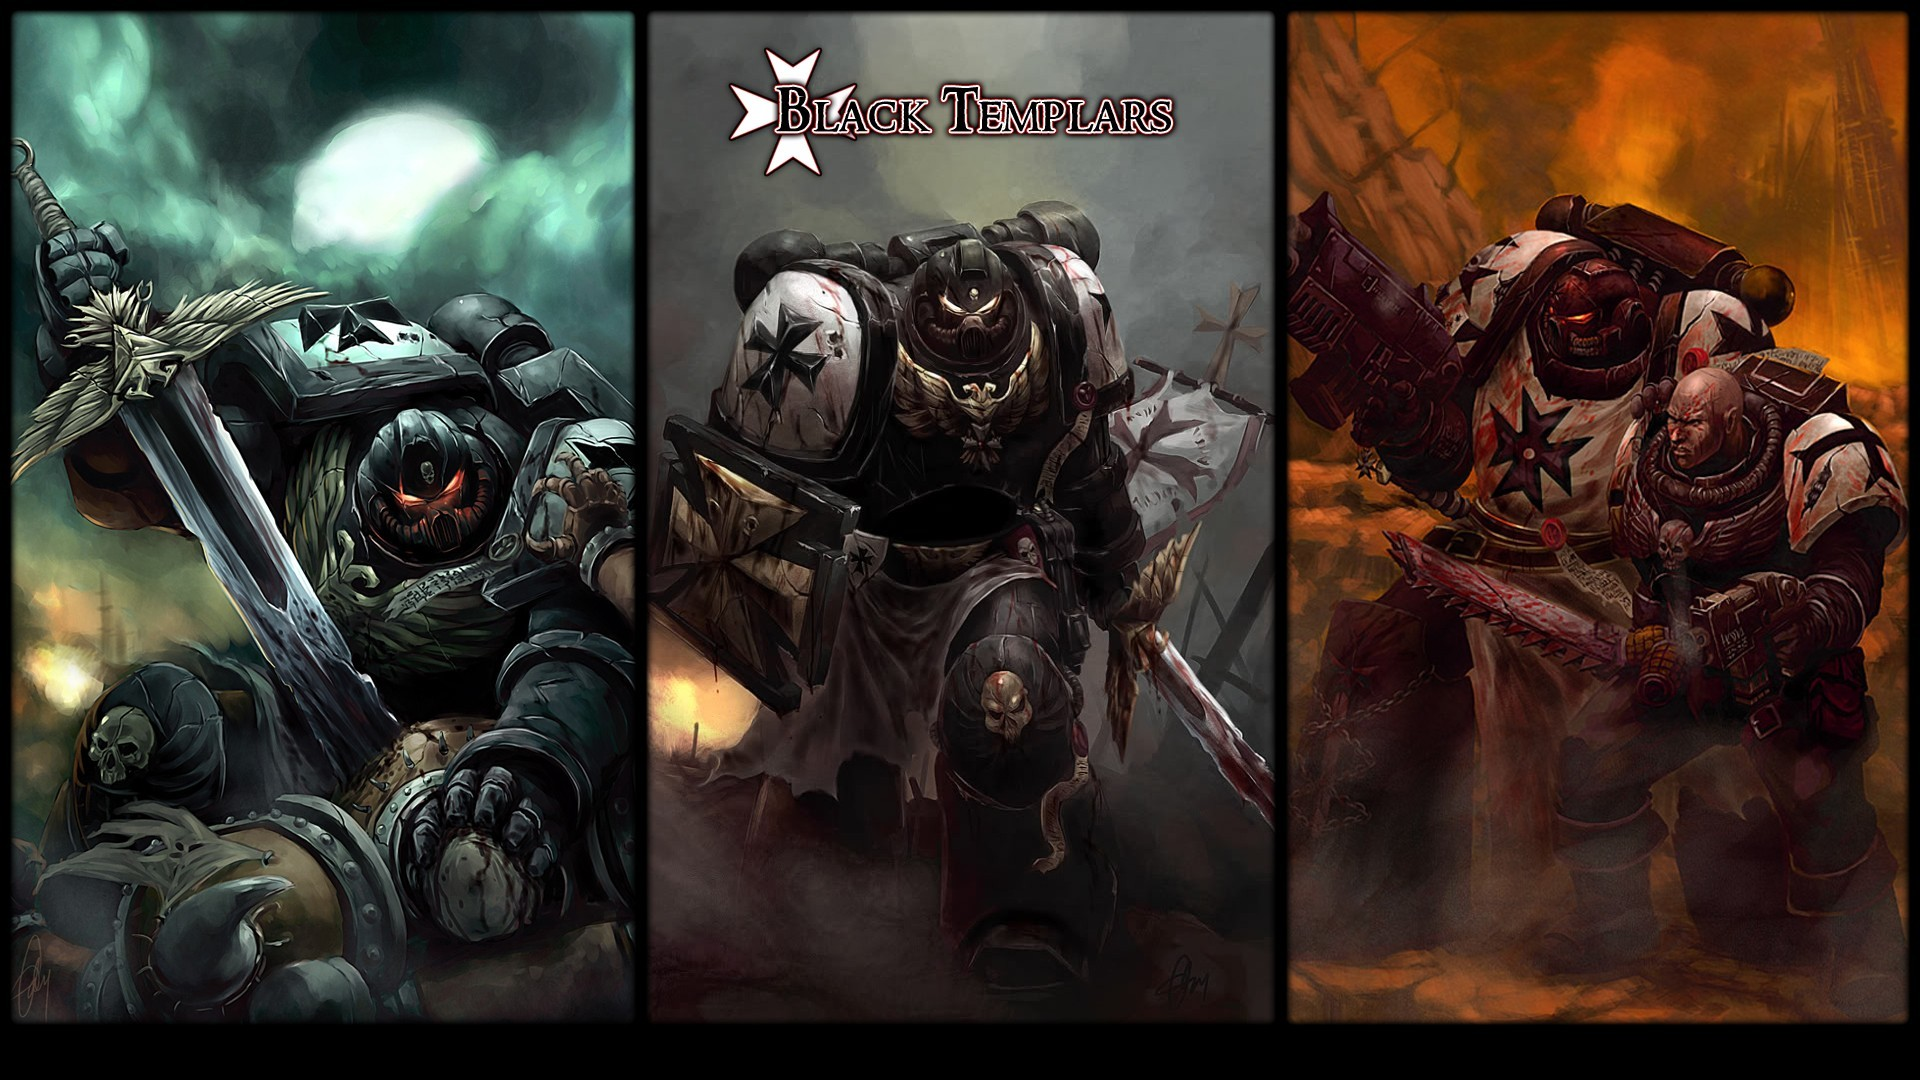 Warhammer 40k Desktop Wallpapers (28 Wallpapers). 22.02.2017 adminVideo Game